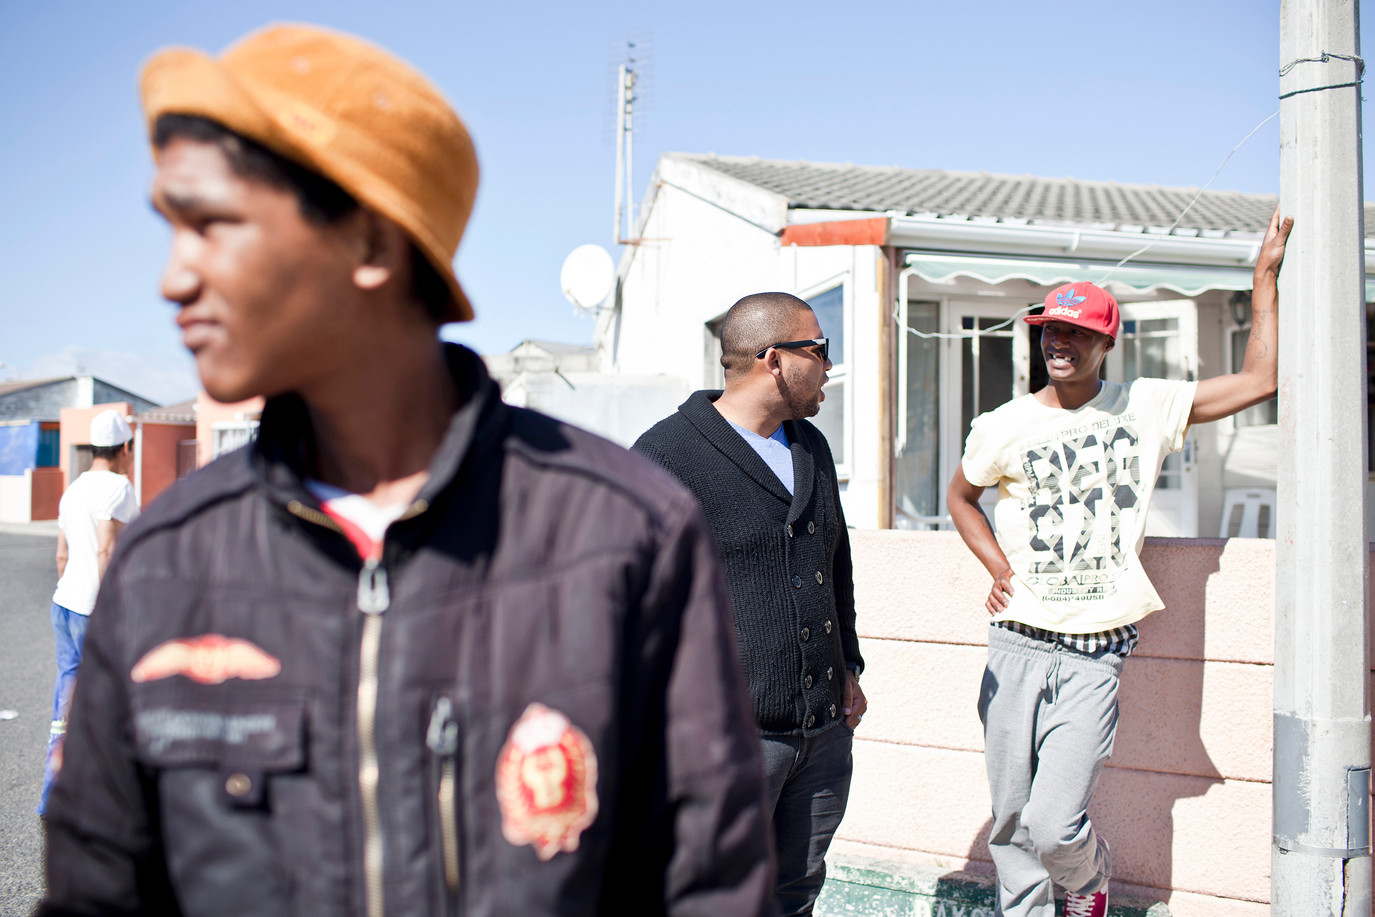 NGO_CSR-RLABS-South Africa 005.jpg